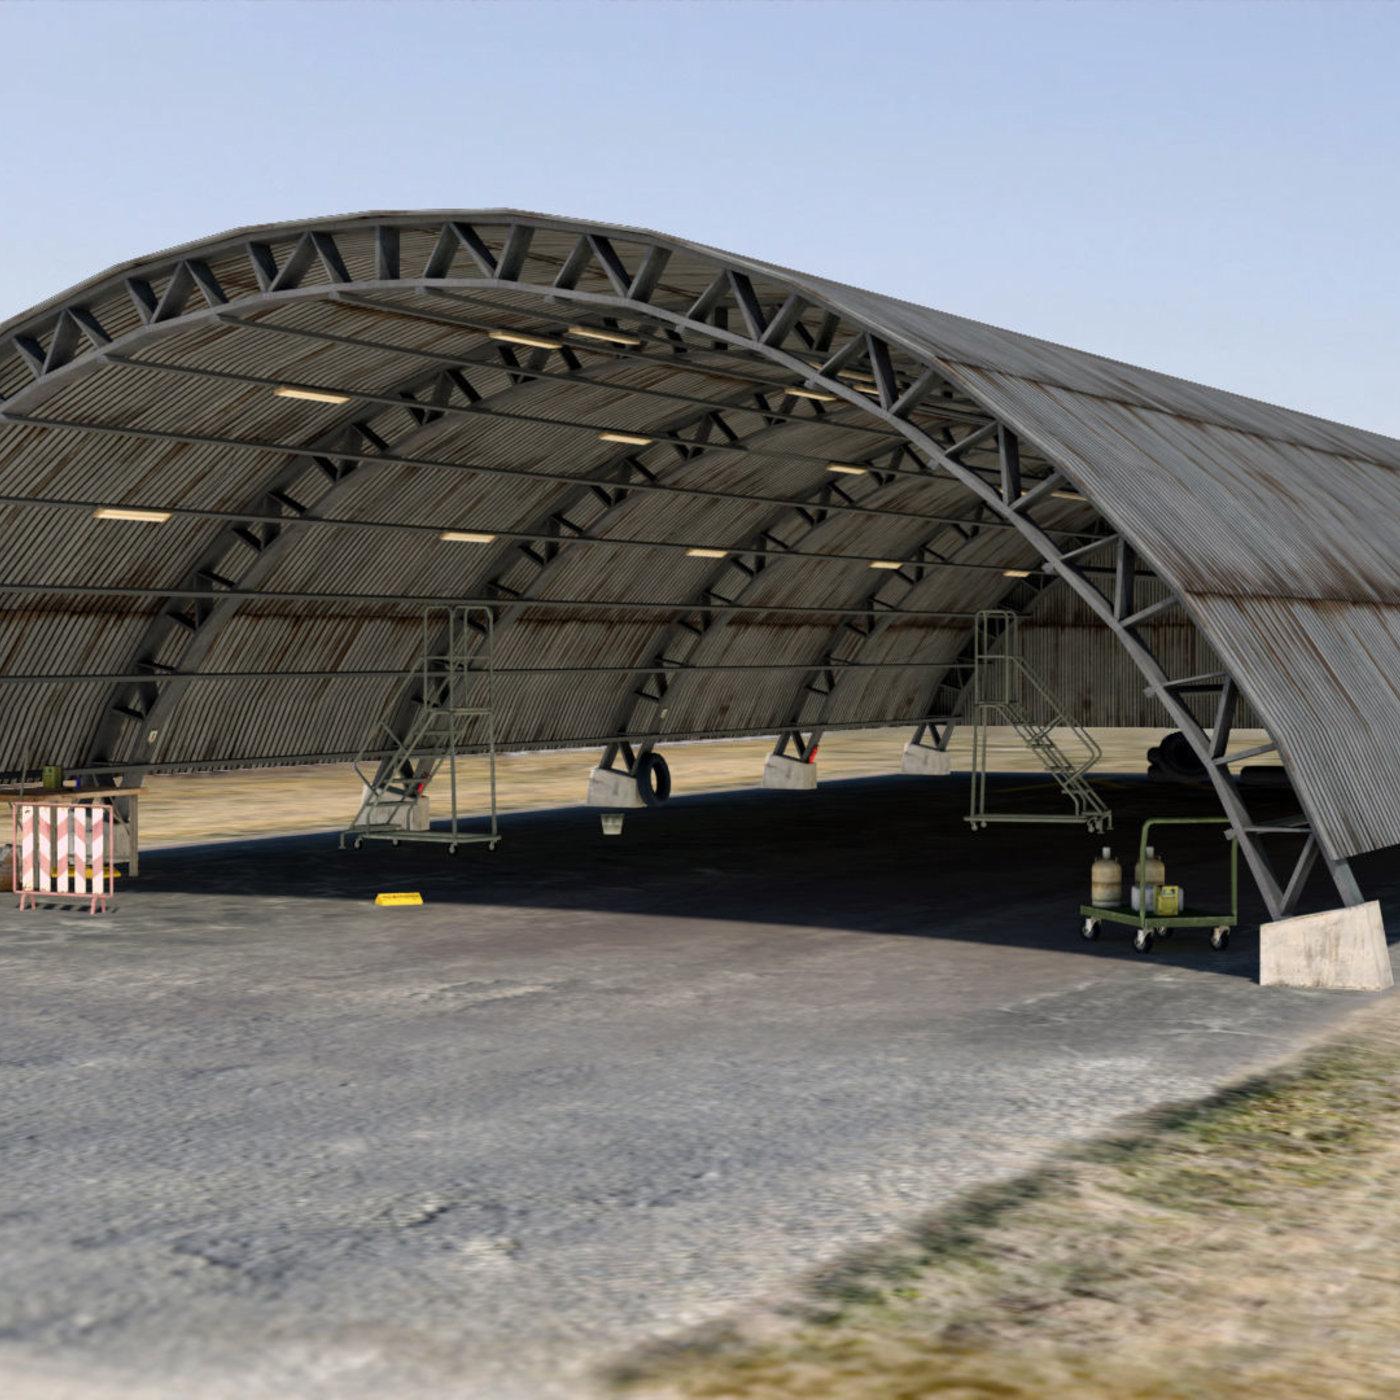 Air Hangar